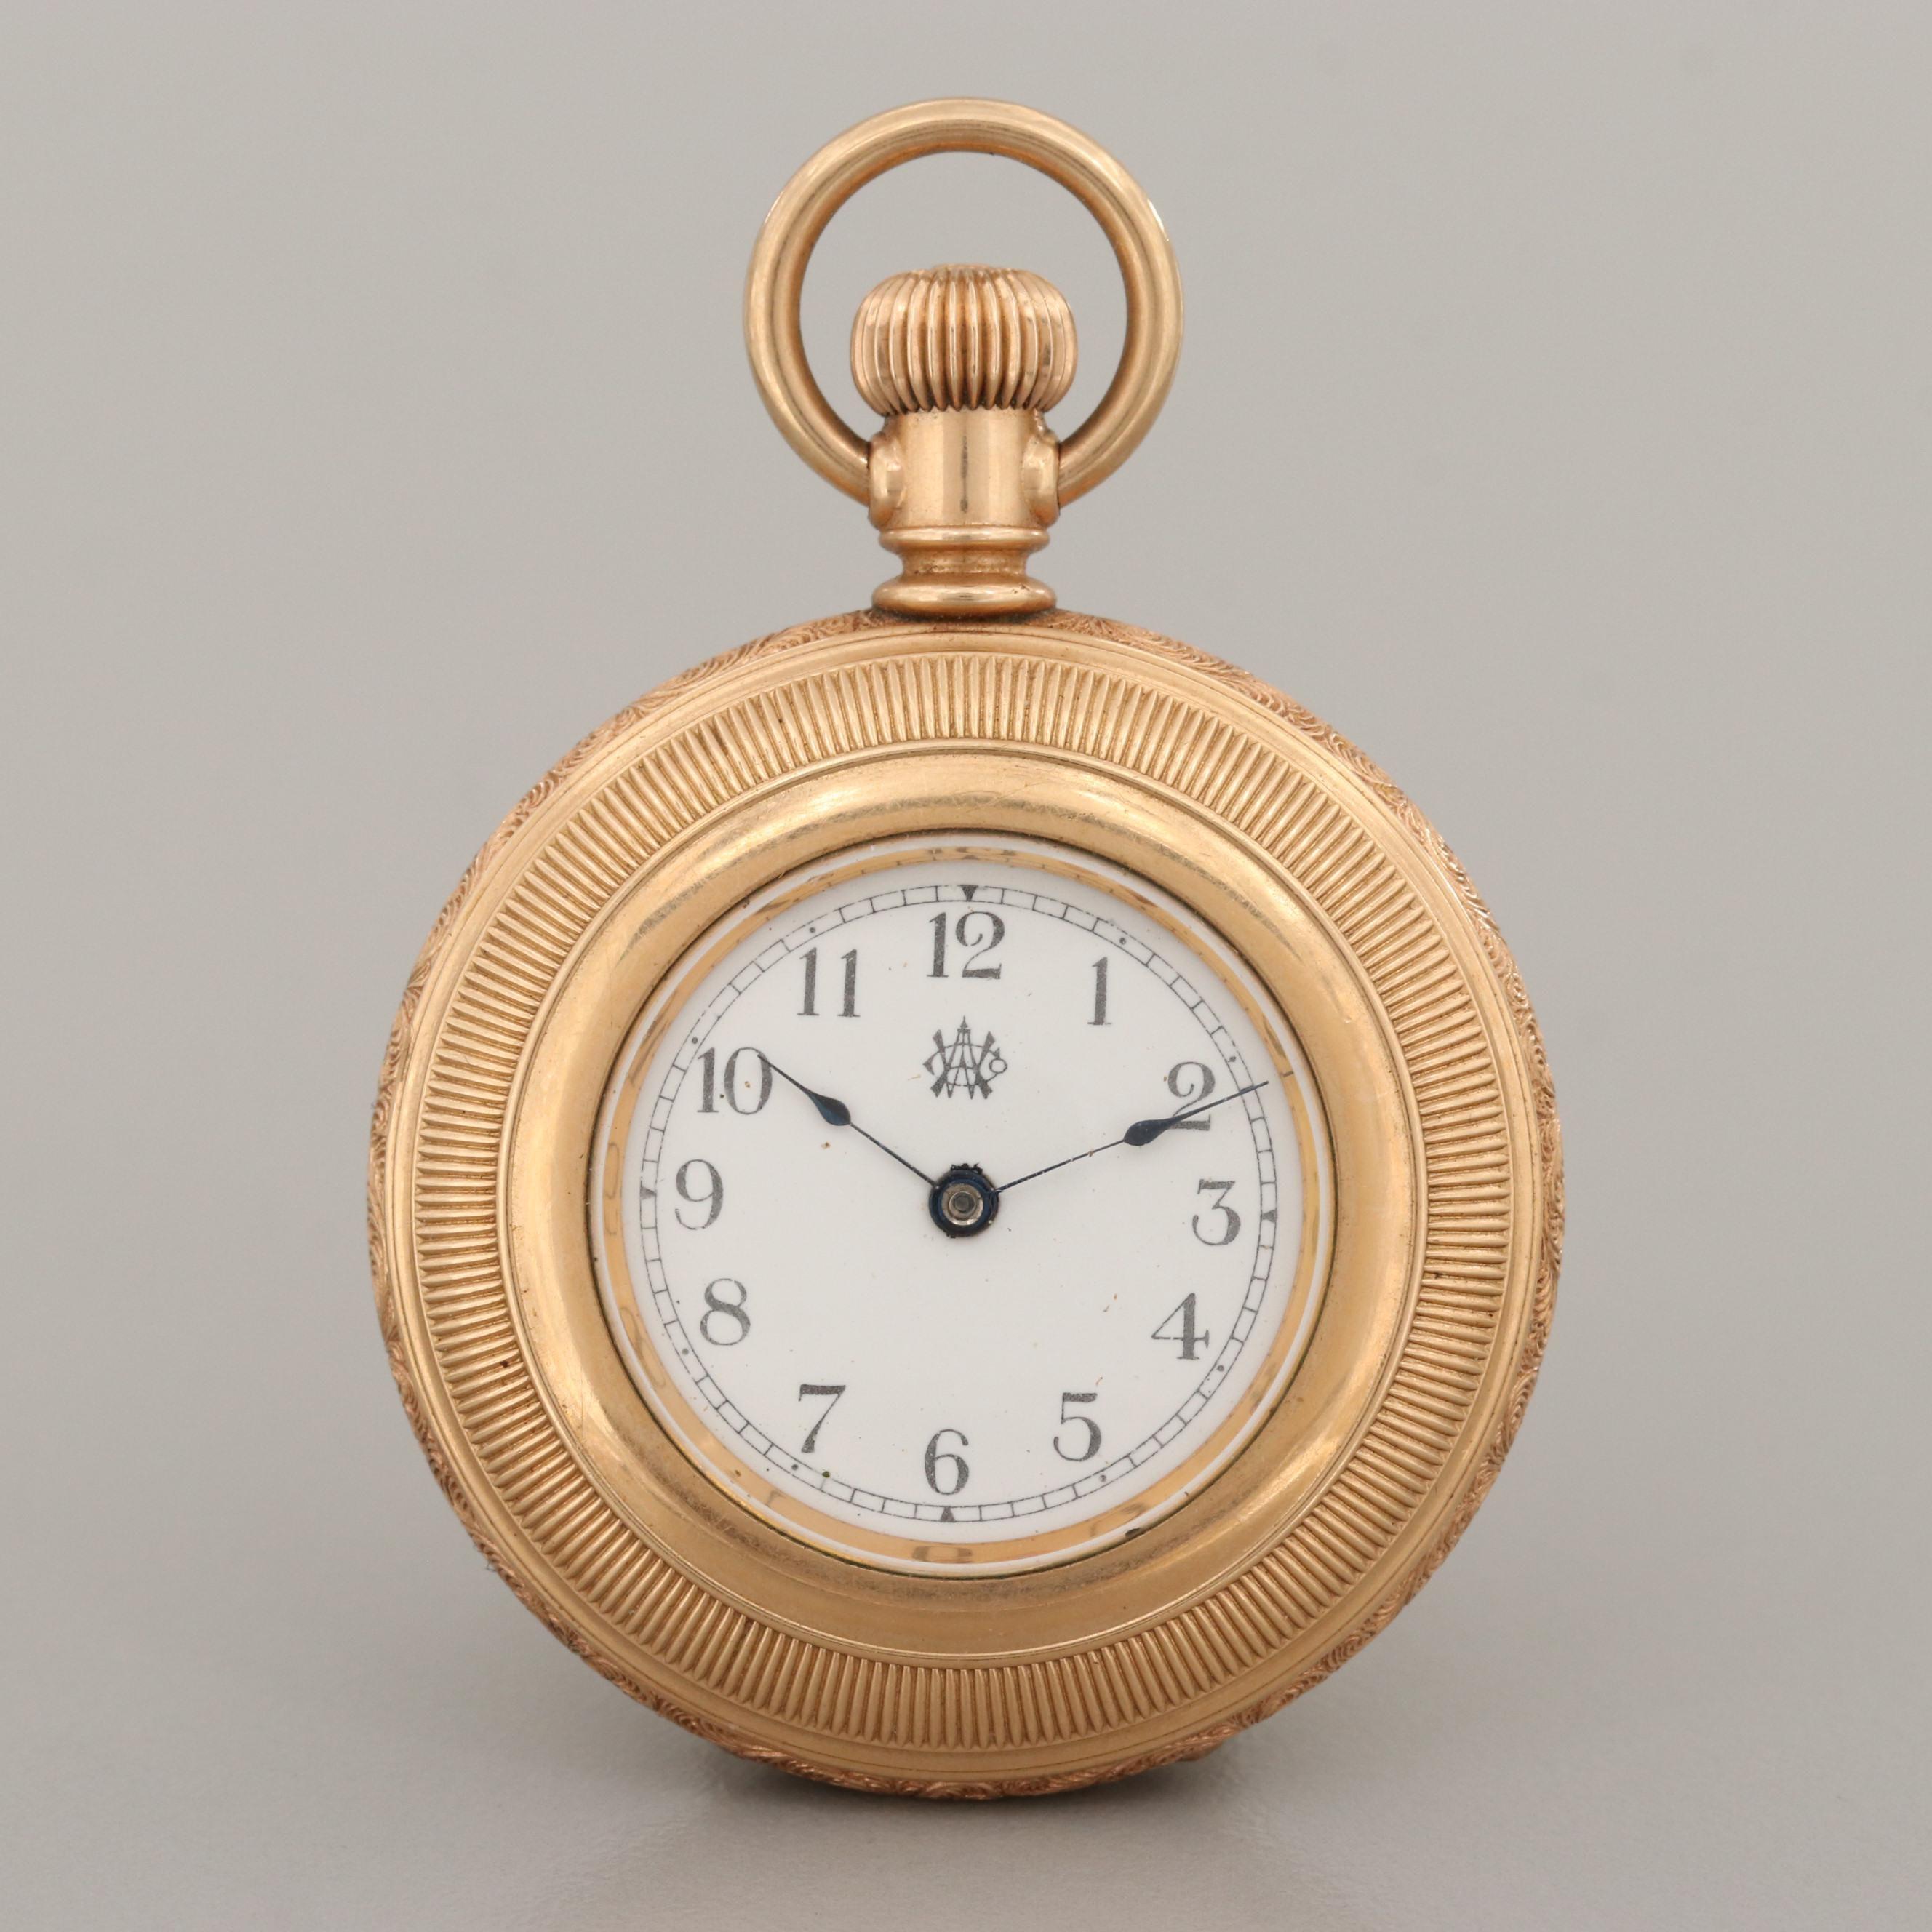 American Waltham Gold Filled Pocket Watch, 1890